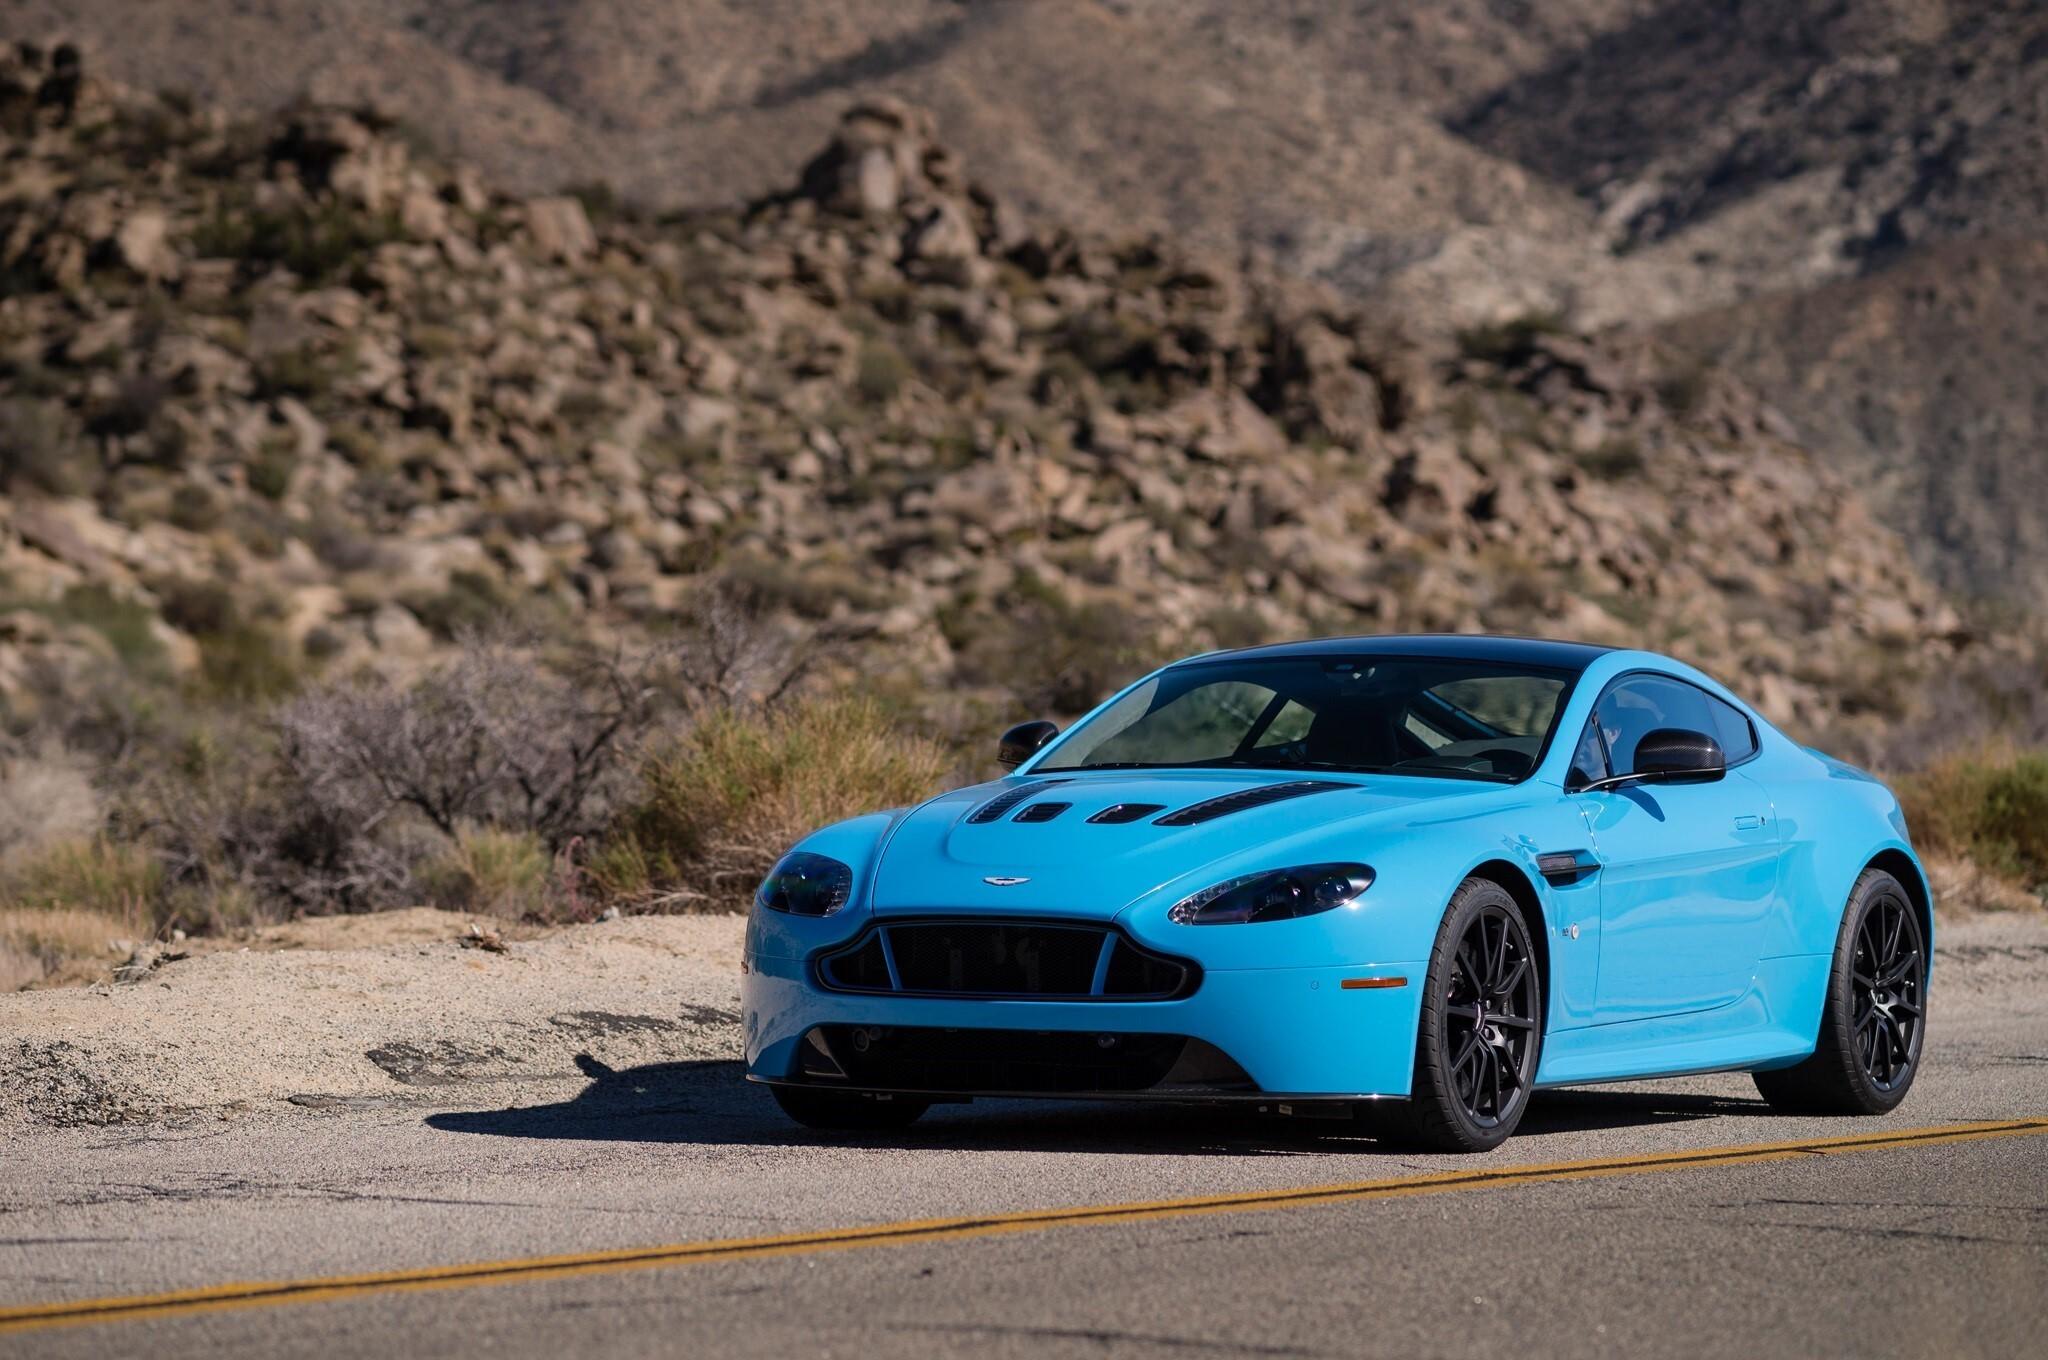 2015 Blue Aston Martin V12 Vantage S Front Cars Nice